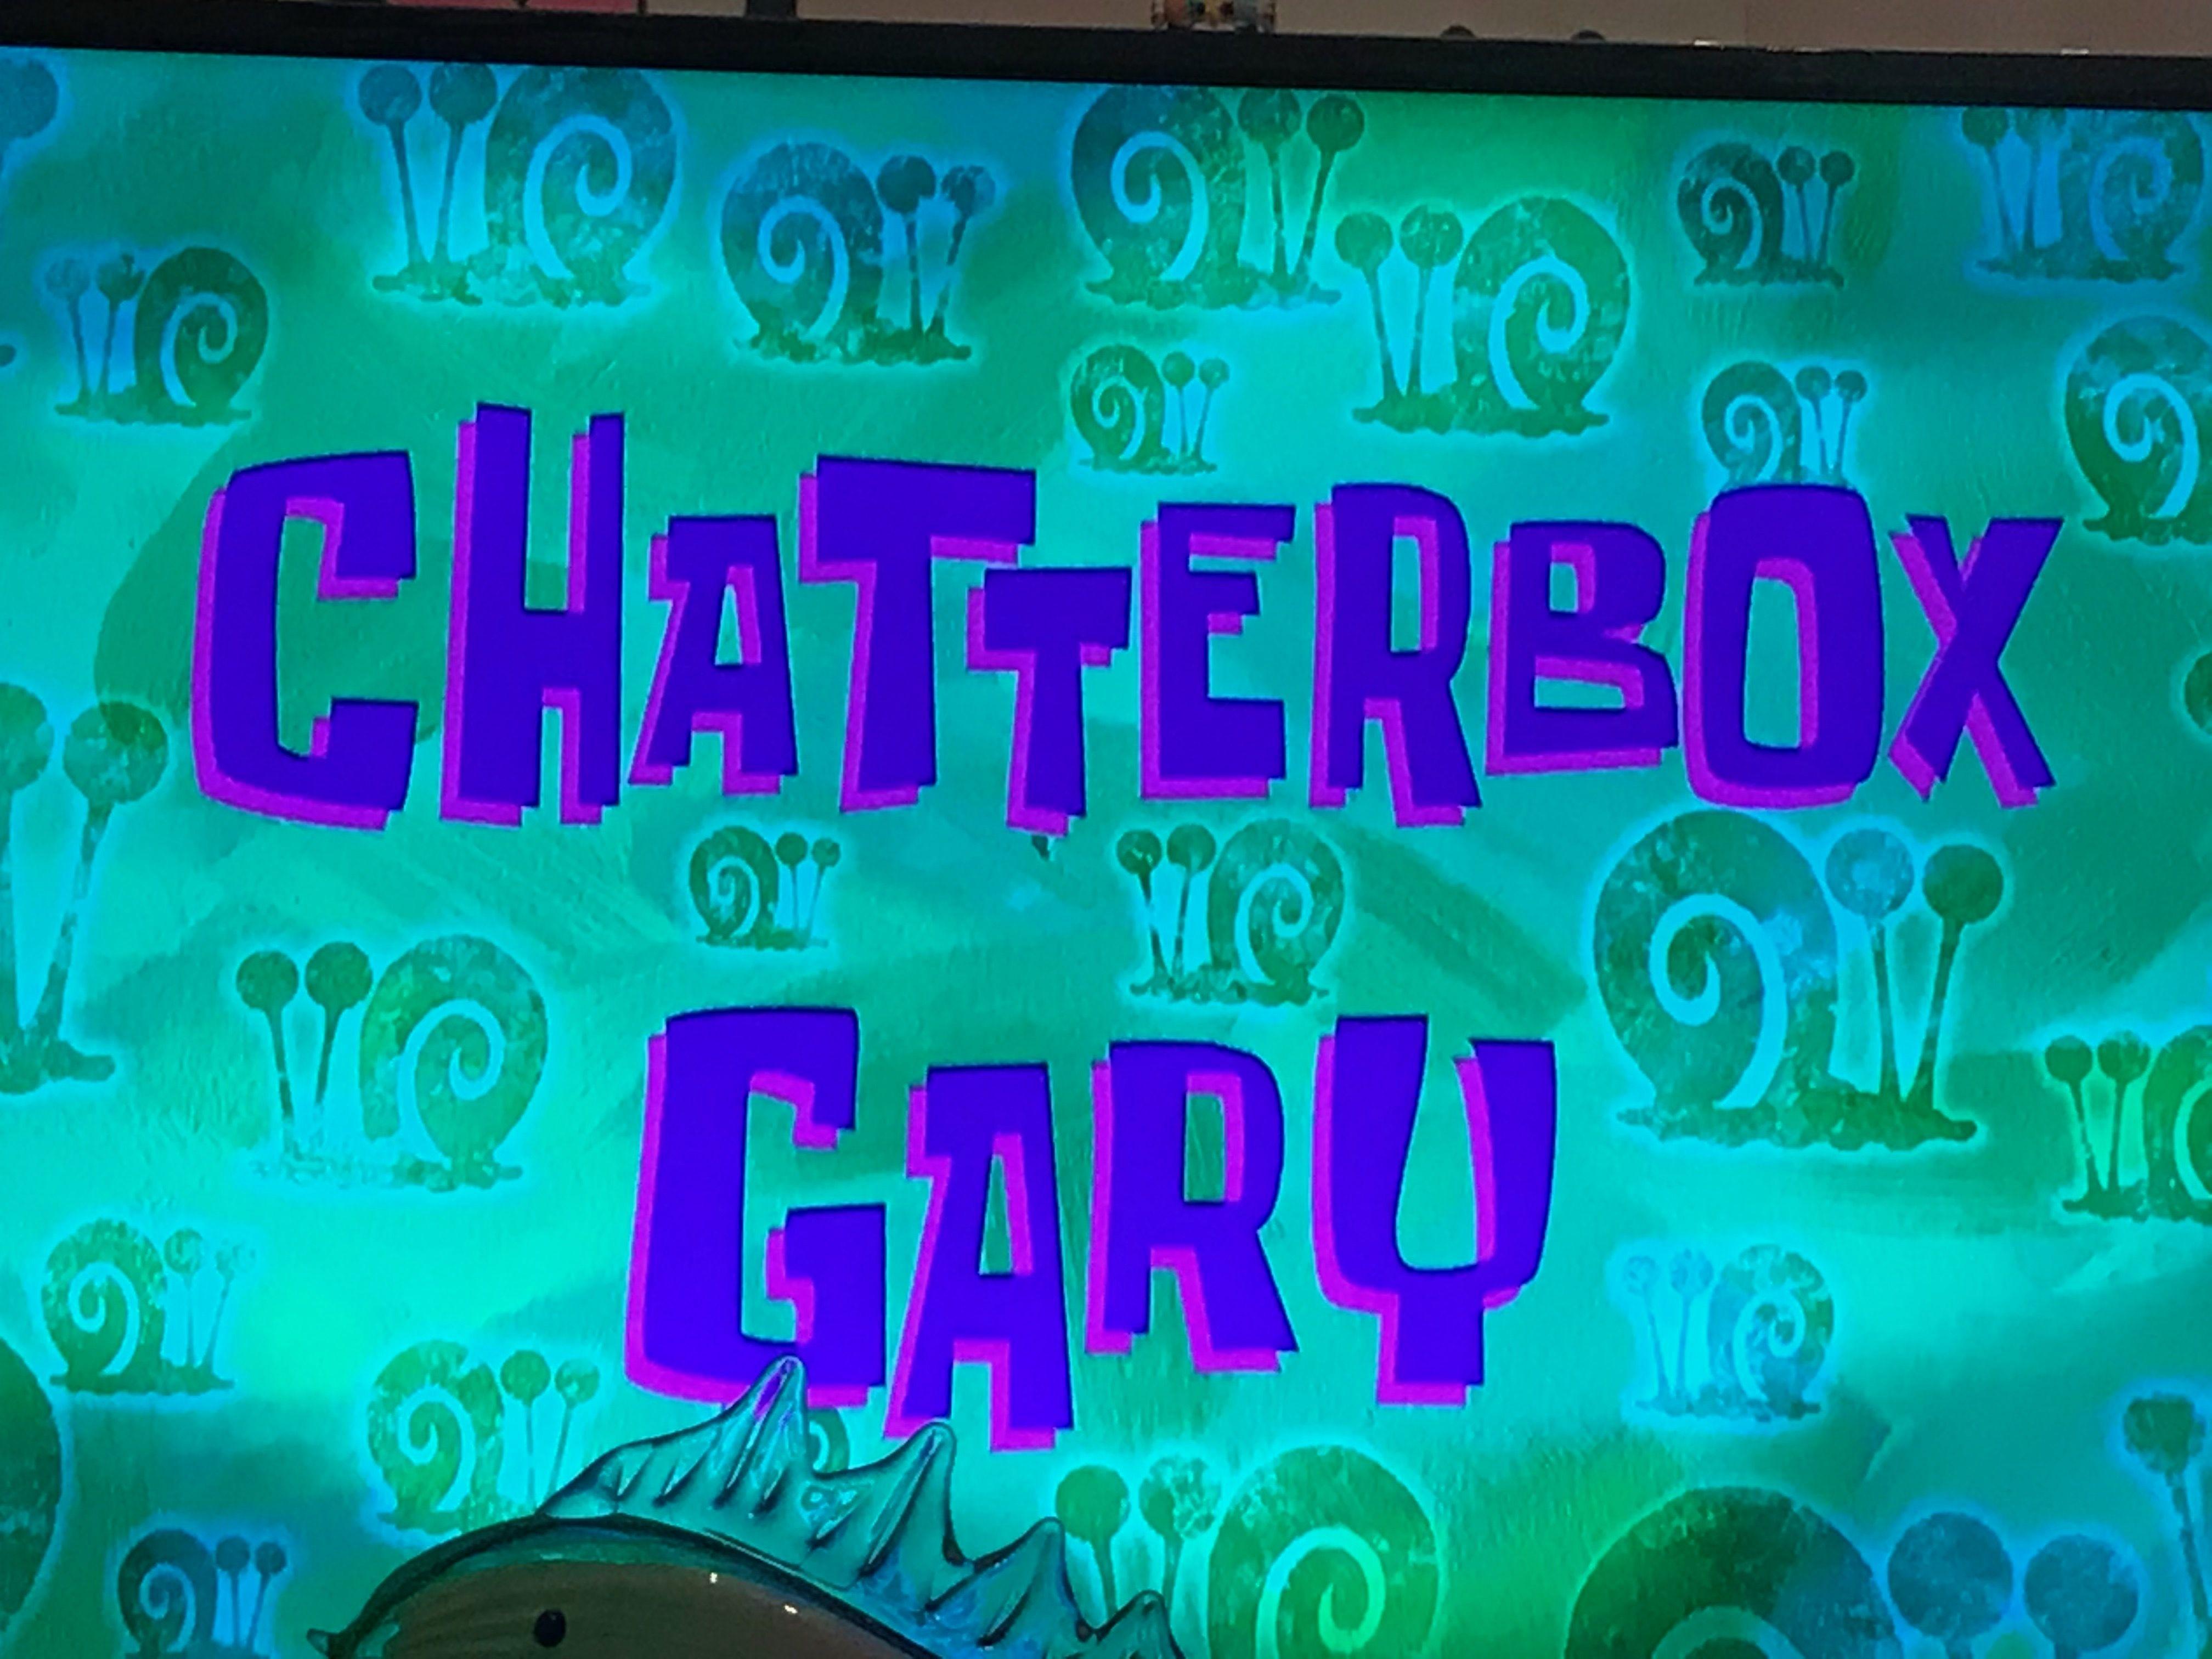 Pin By Cheshire Cat On Spongebob Funny Messages Spongebob Squarepants Squarepants